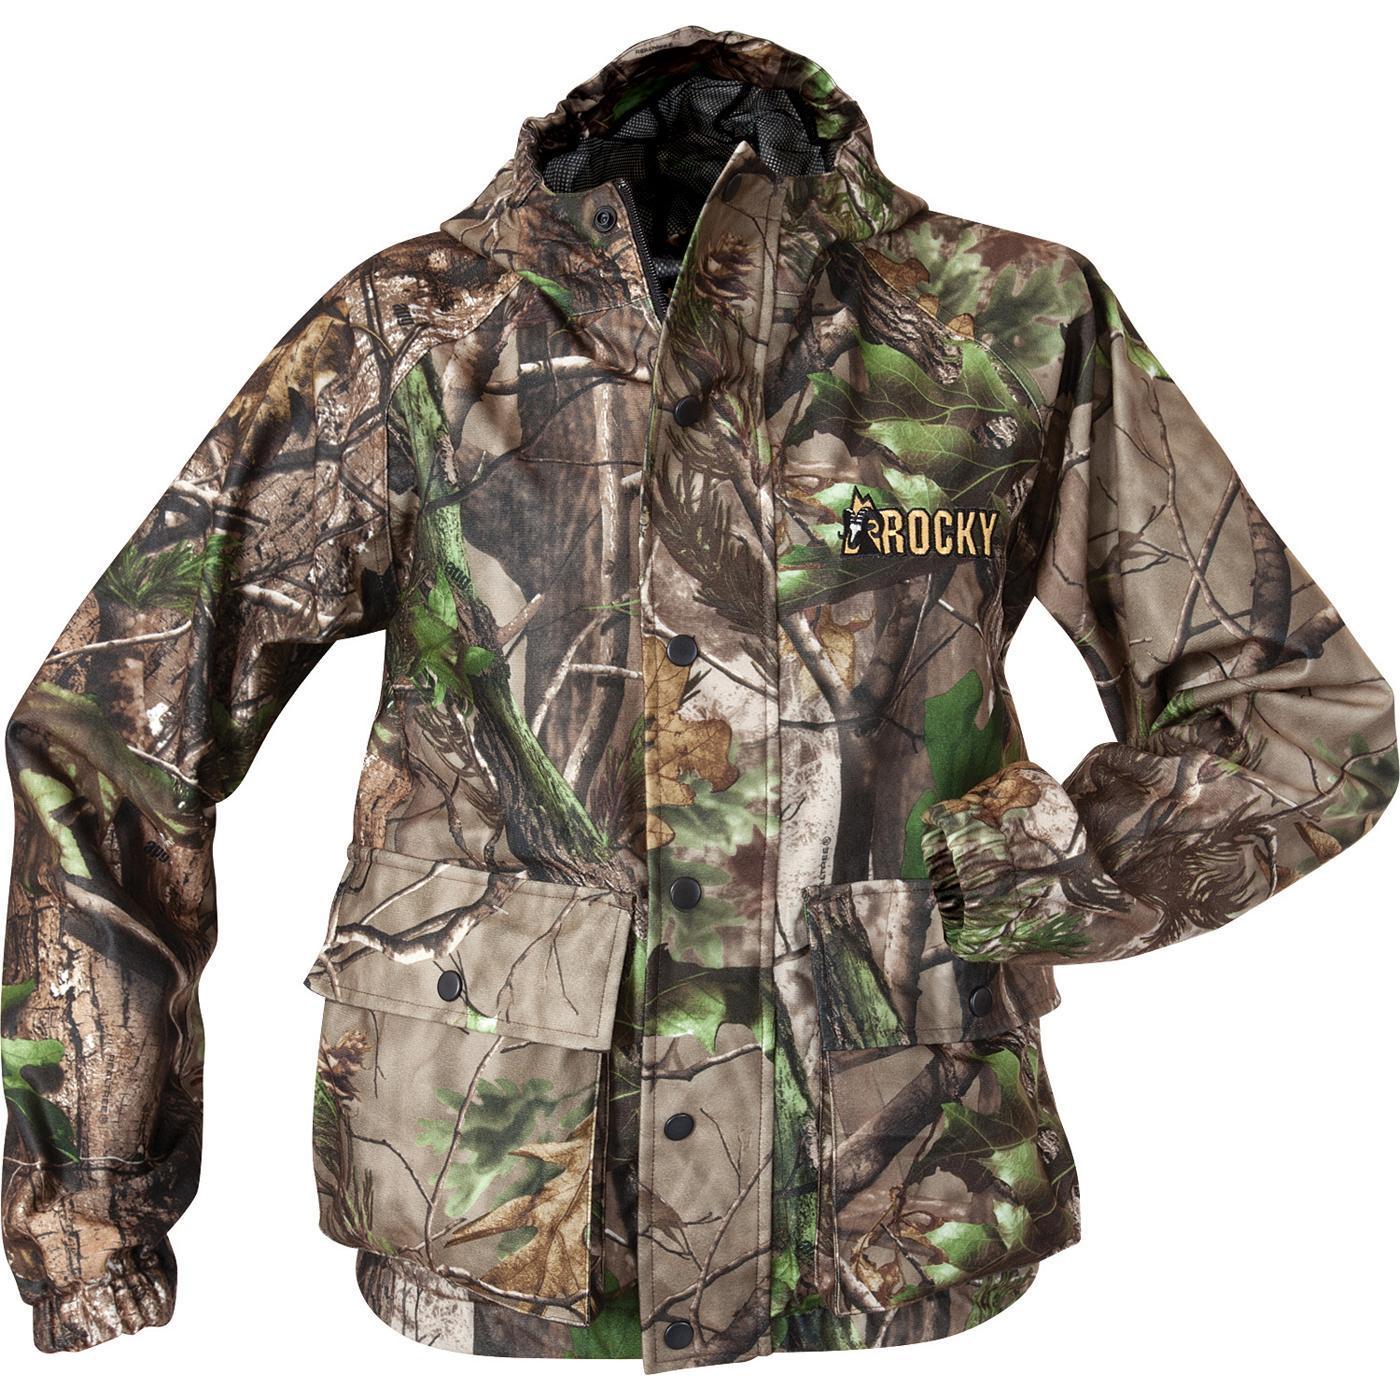 Rocky Junior Prohunter Realtree Ap Camouflage Rain Jacket